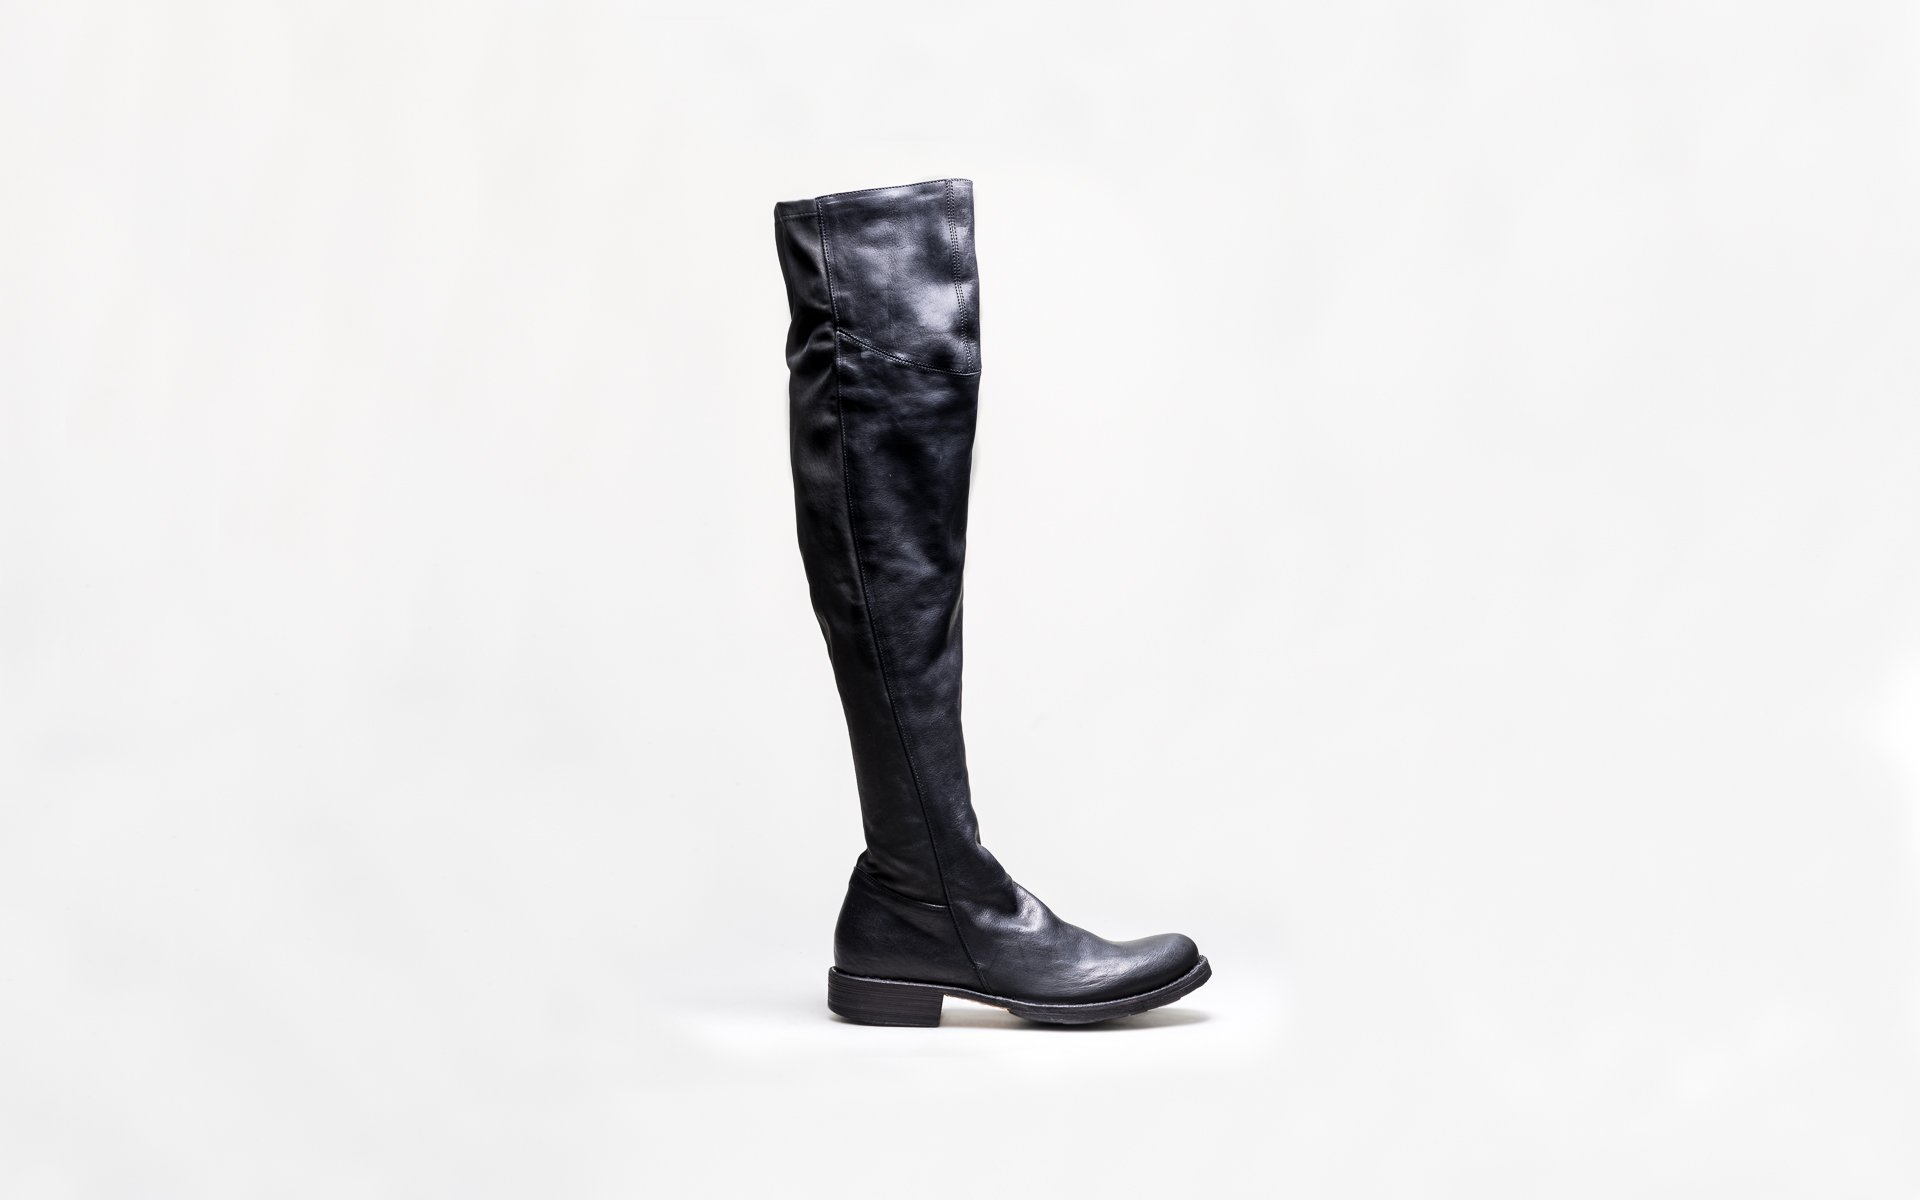 Eternity_Evita_OverthekneeBoot_Black_Leather-1_2048x2048.jpg